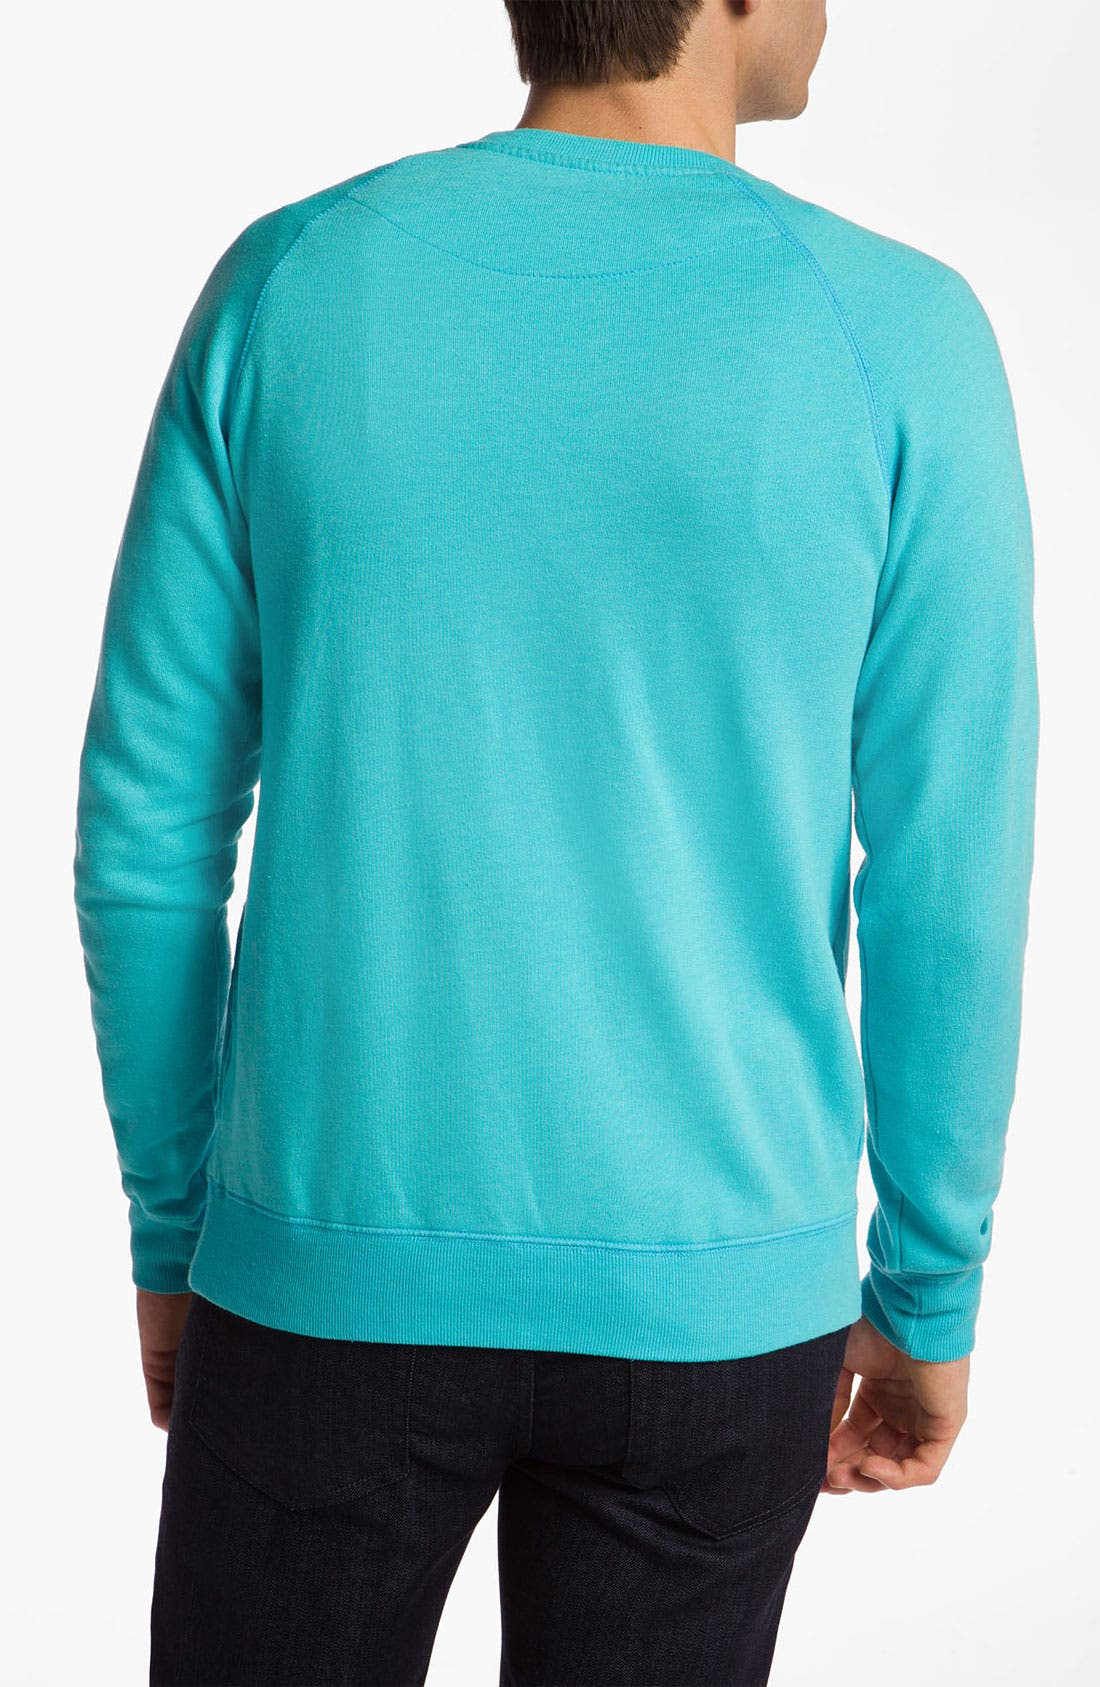 Alternate Image 2  - Topo Ranch 'Swell Rise' Crewneck Sweatshirt